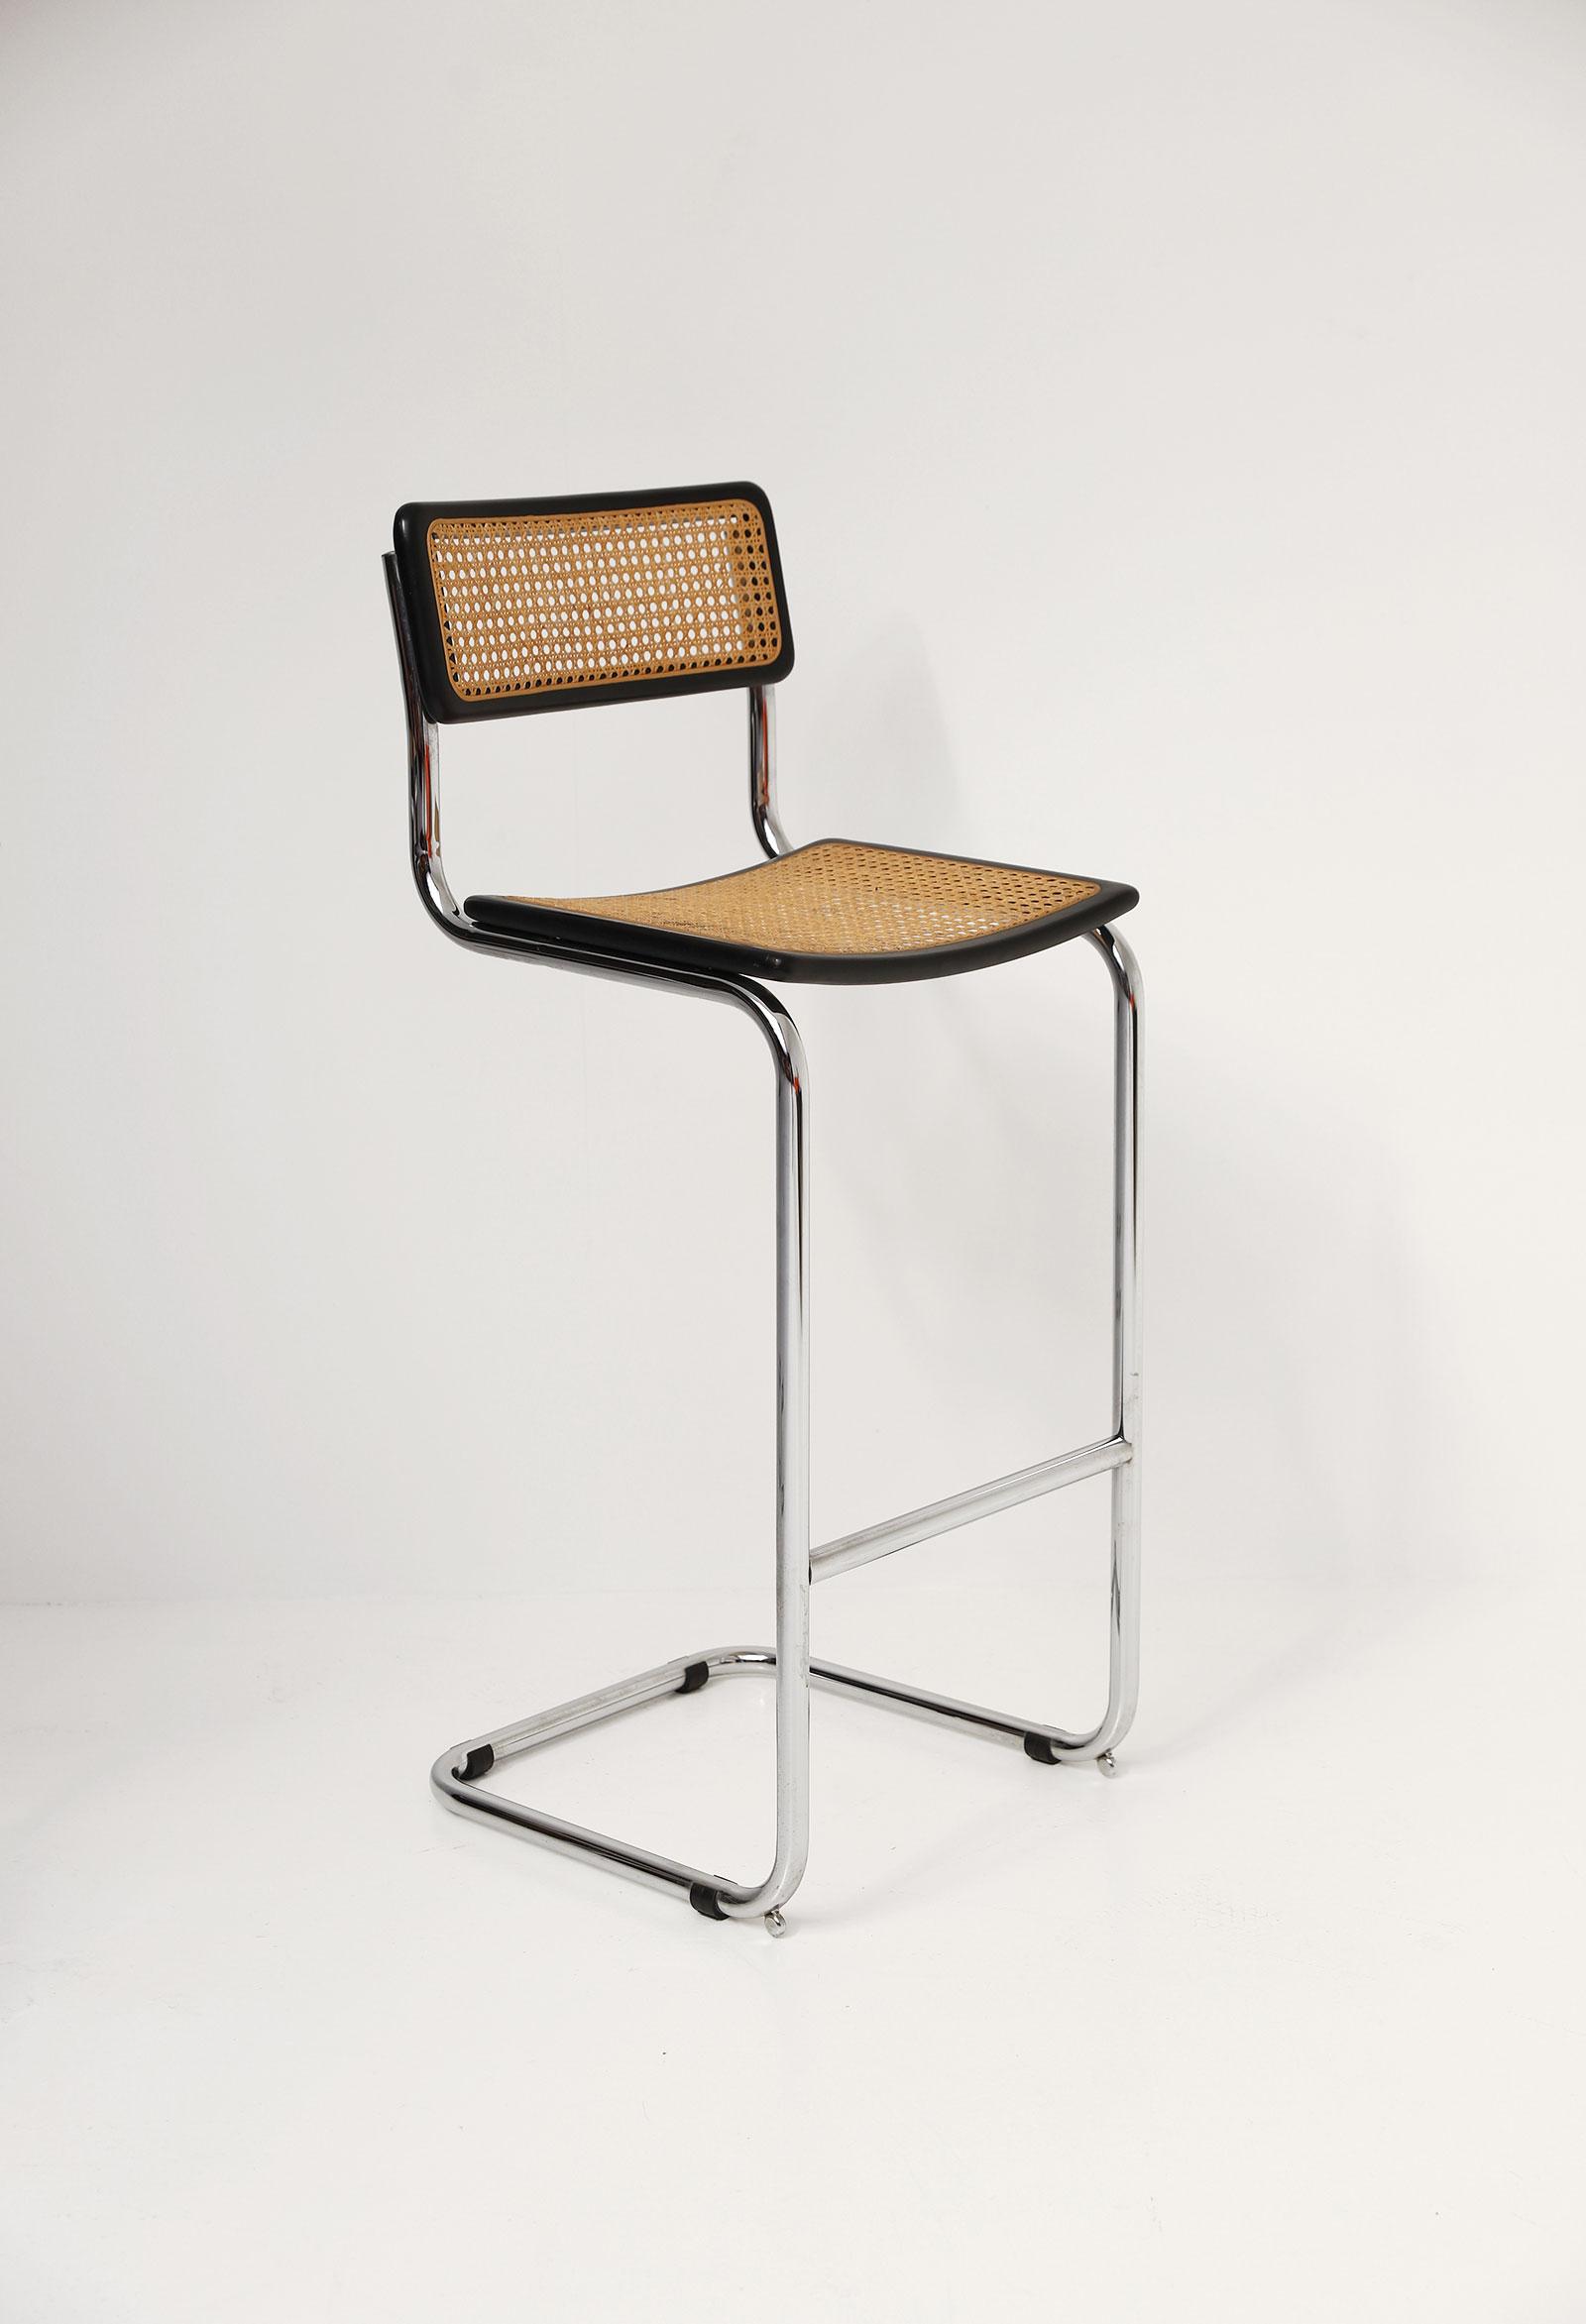 Cesca cantilever bar stools image 6